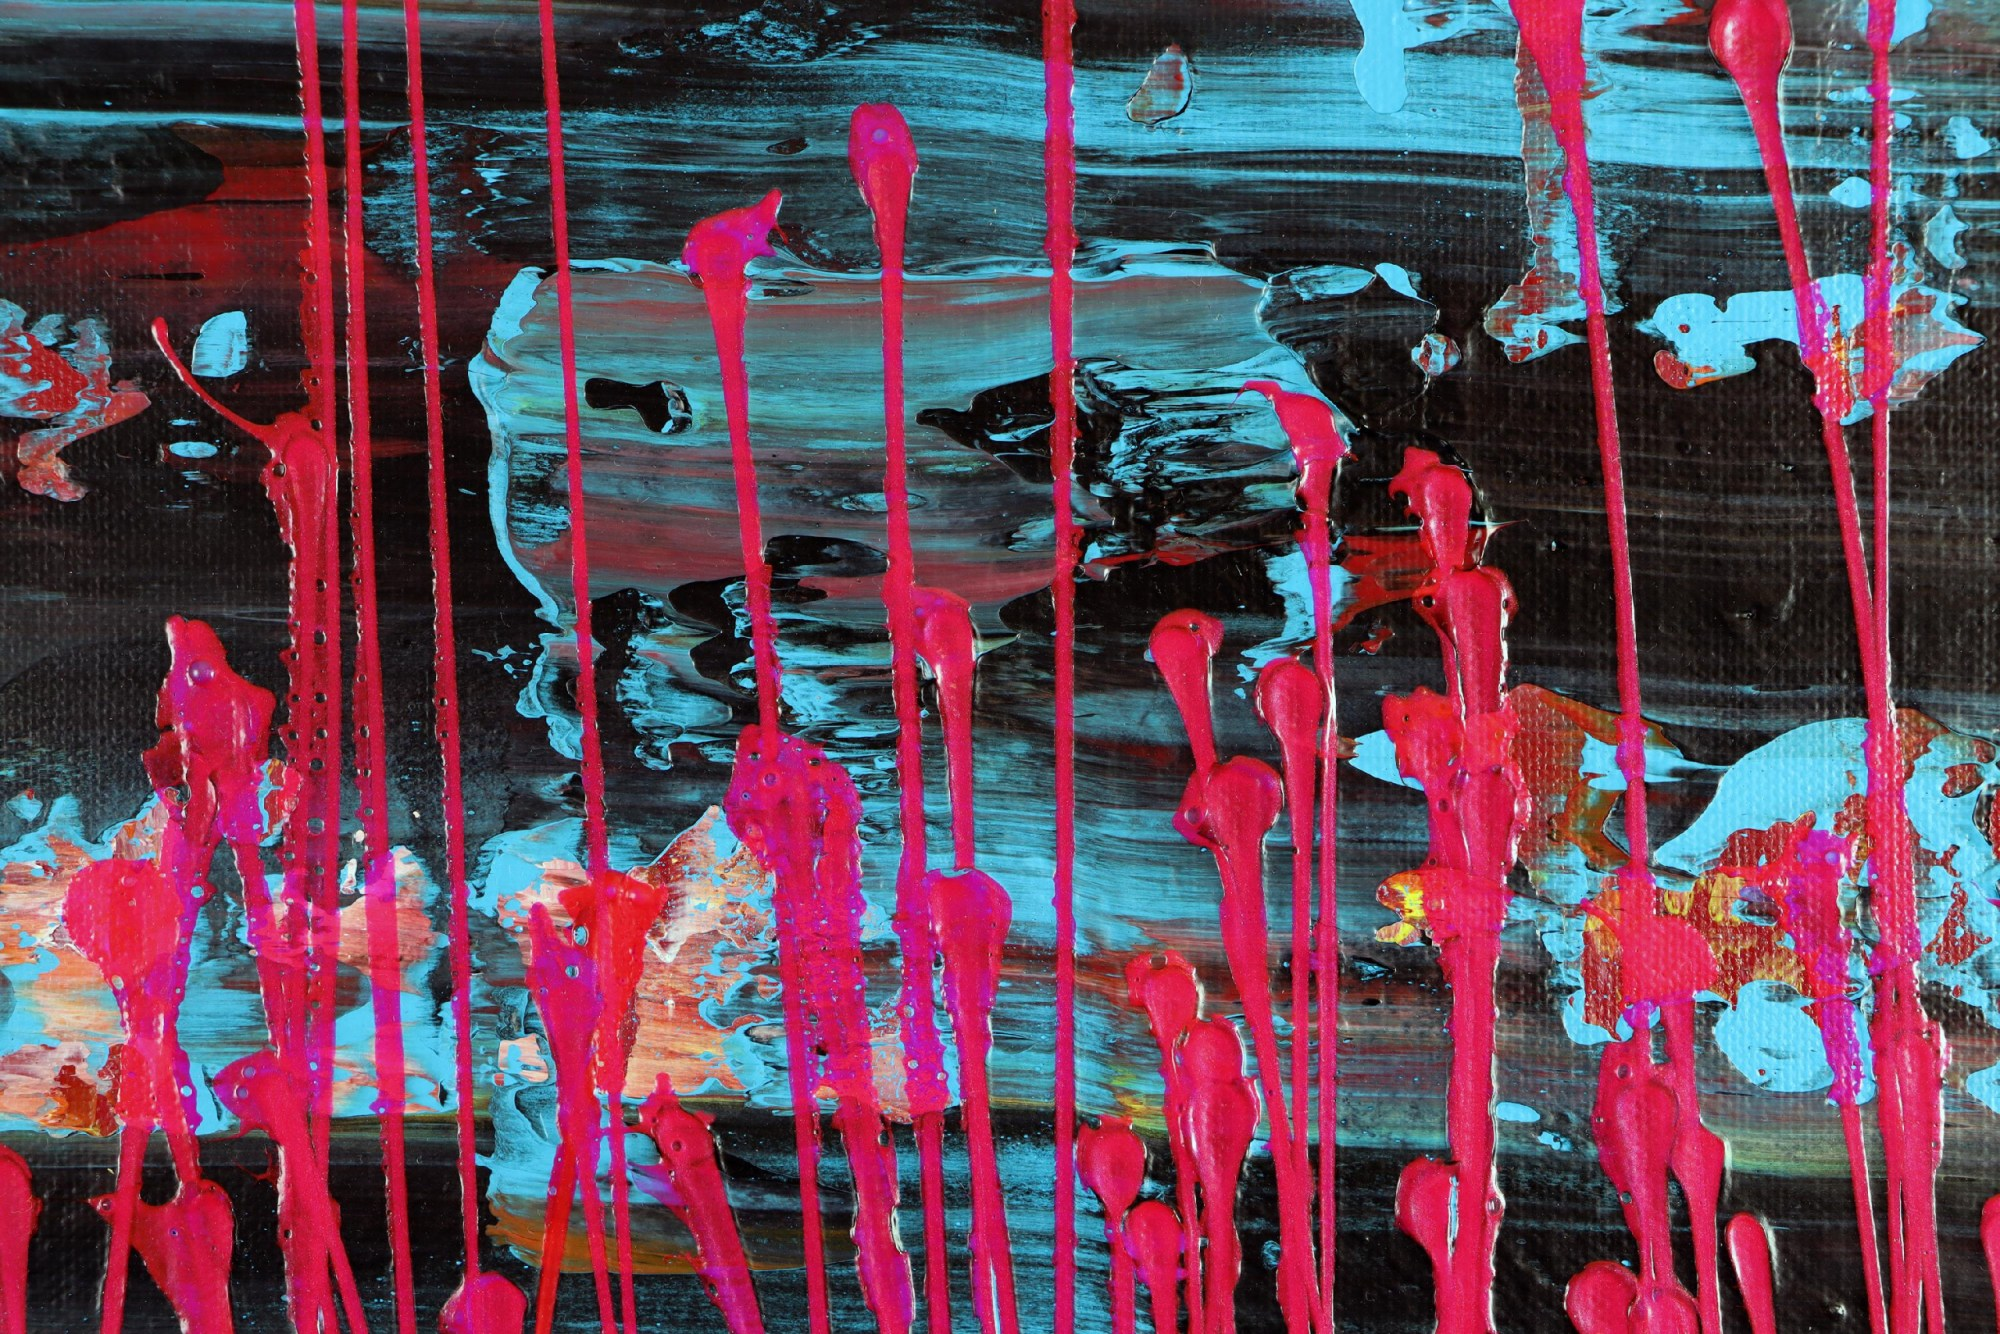 SOLD - Pink Frequencies (Electric Panorama) (2021) / Artist: Nestor Toro